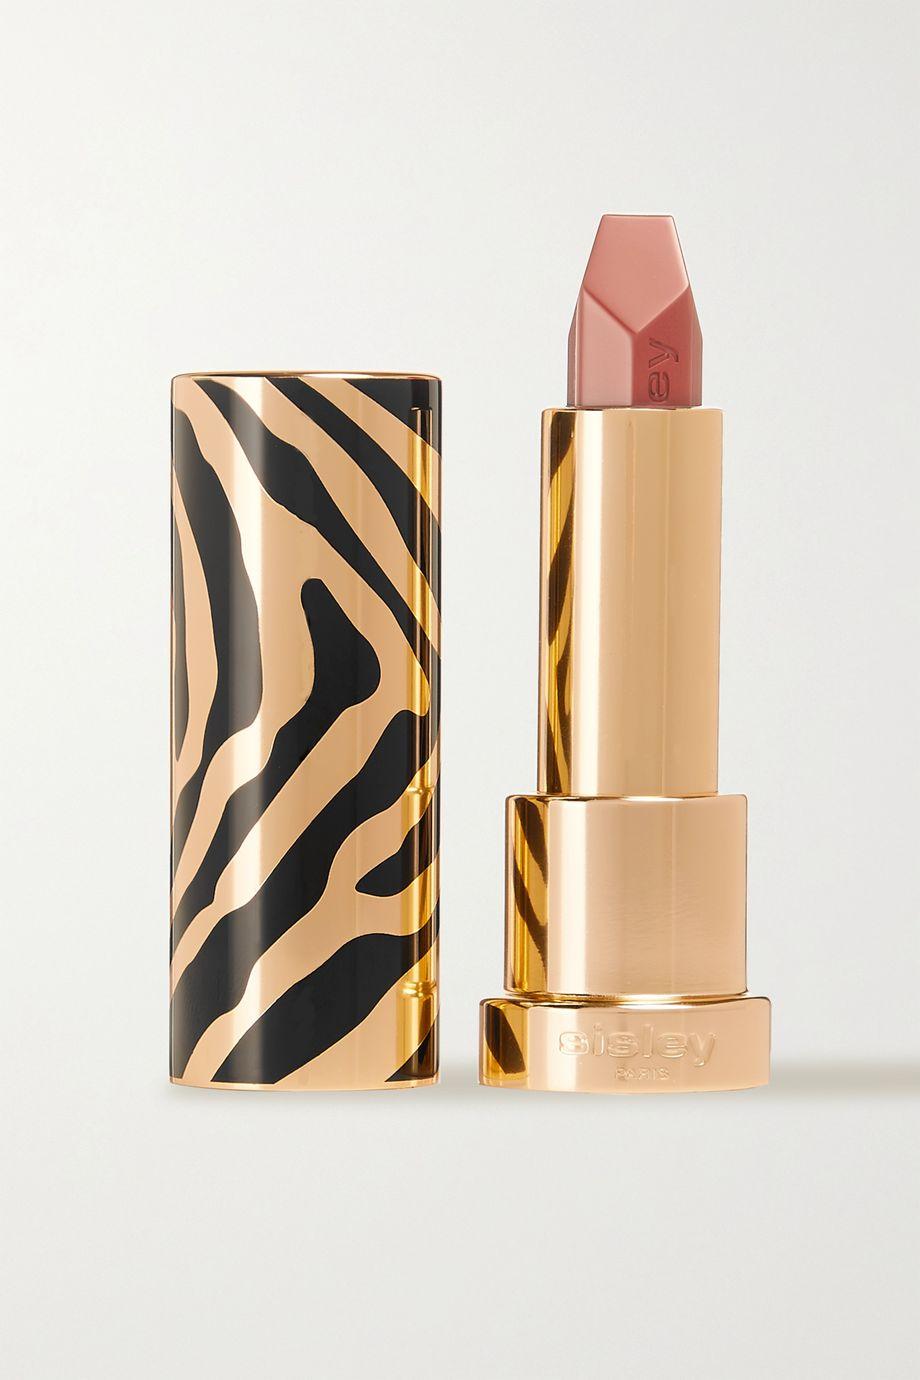 Sisley Le Phyto Rouge Lipstick - 10 Beige Jaipur